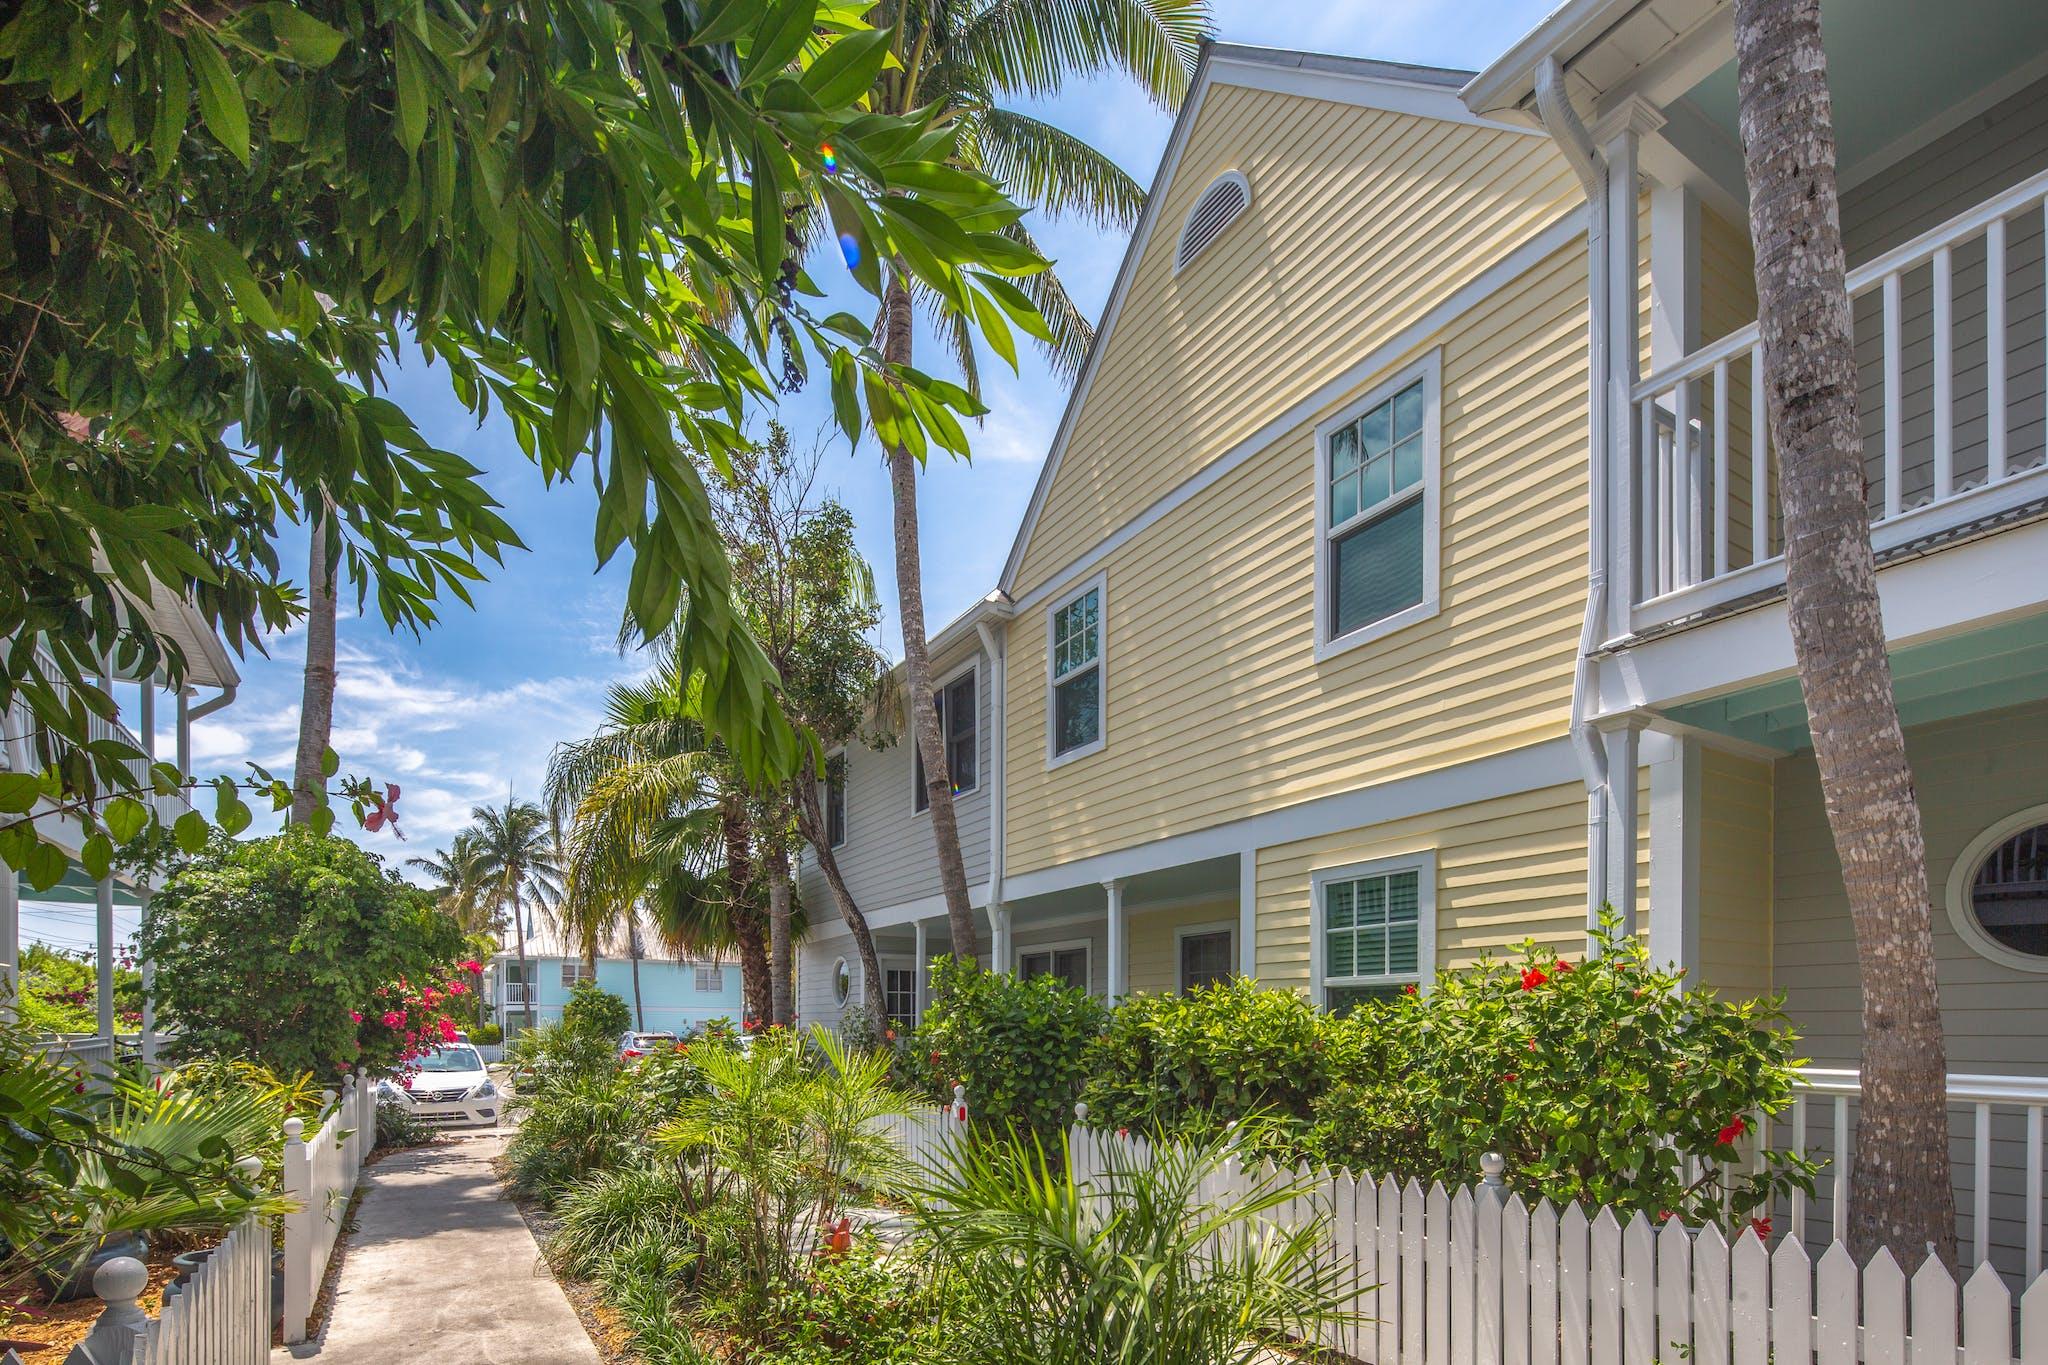 Phenomenal Rent Shipyard Perch Weekly Rental Key West Vacation Rental Interior Design Ideas Clesiryabchikinfo